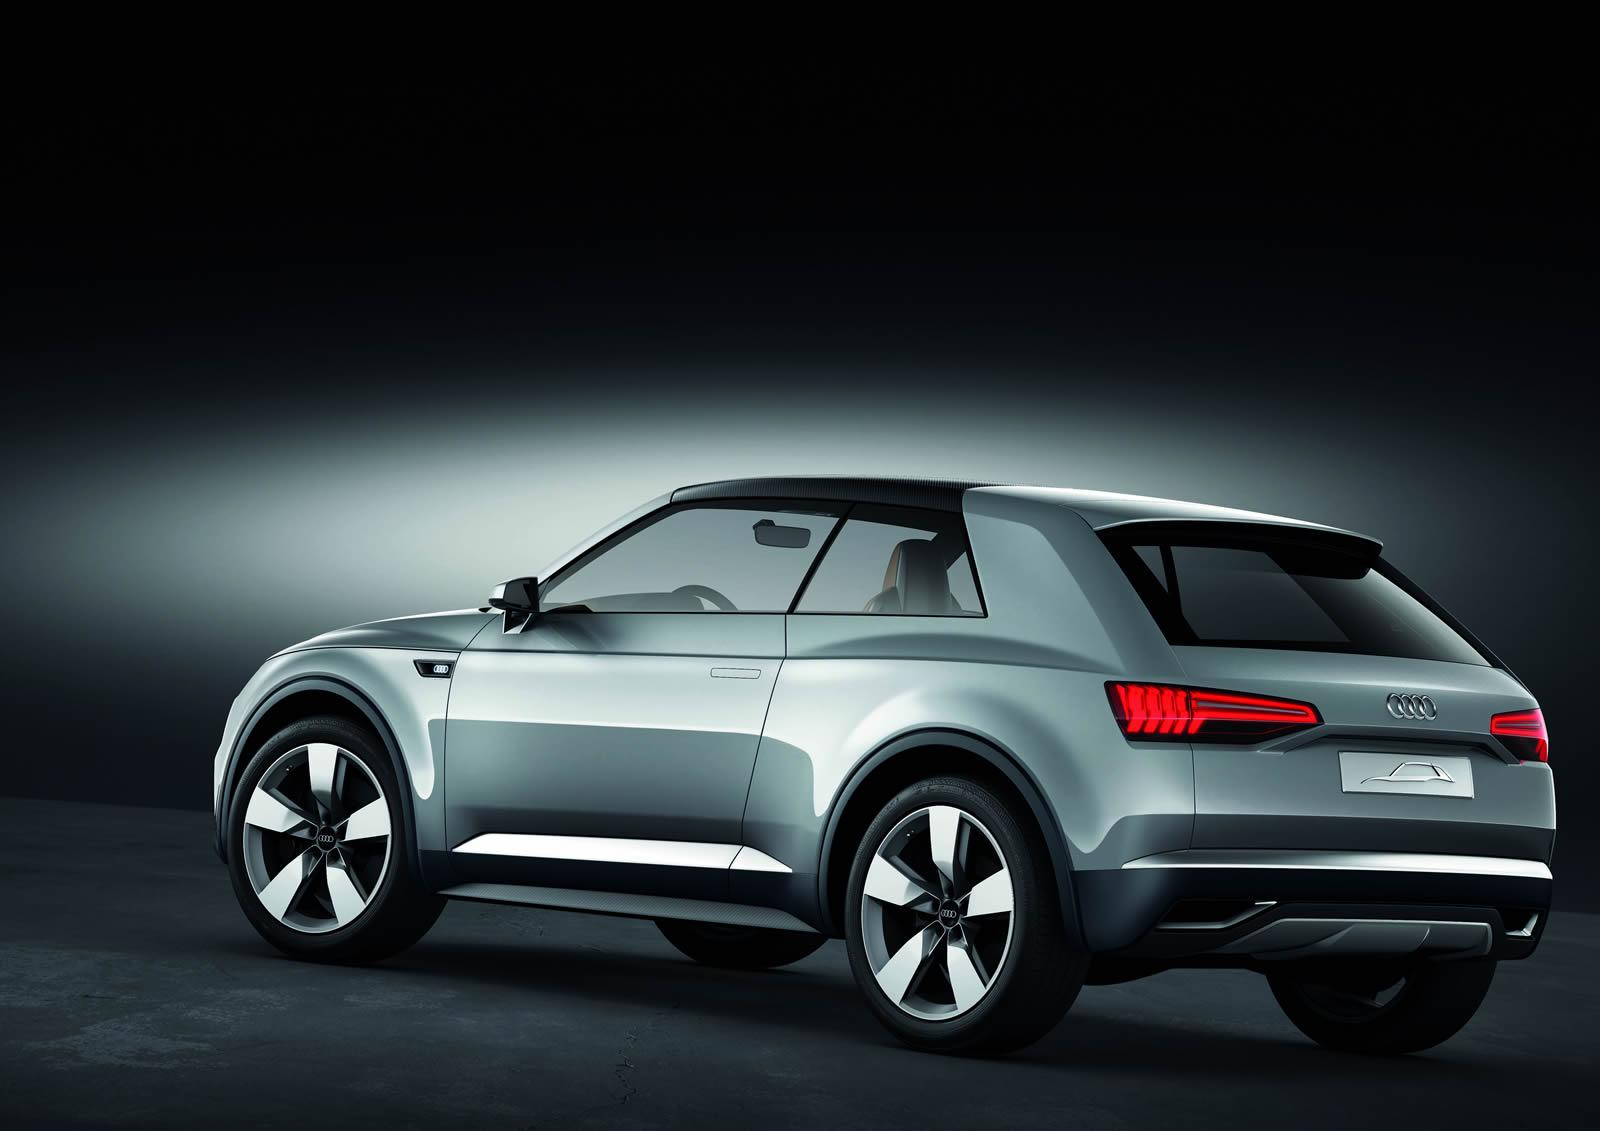 Audi Q8 Dan Toch Bevestigd Groenlicht Be